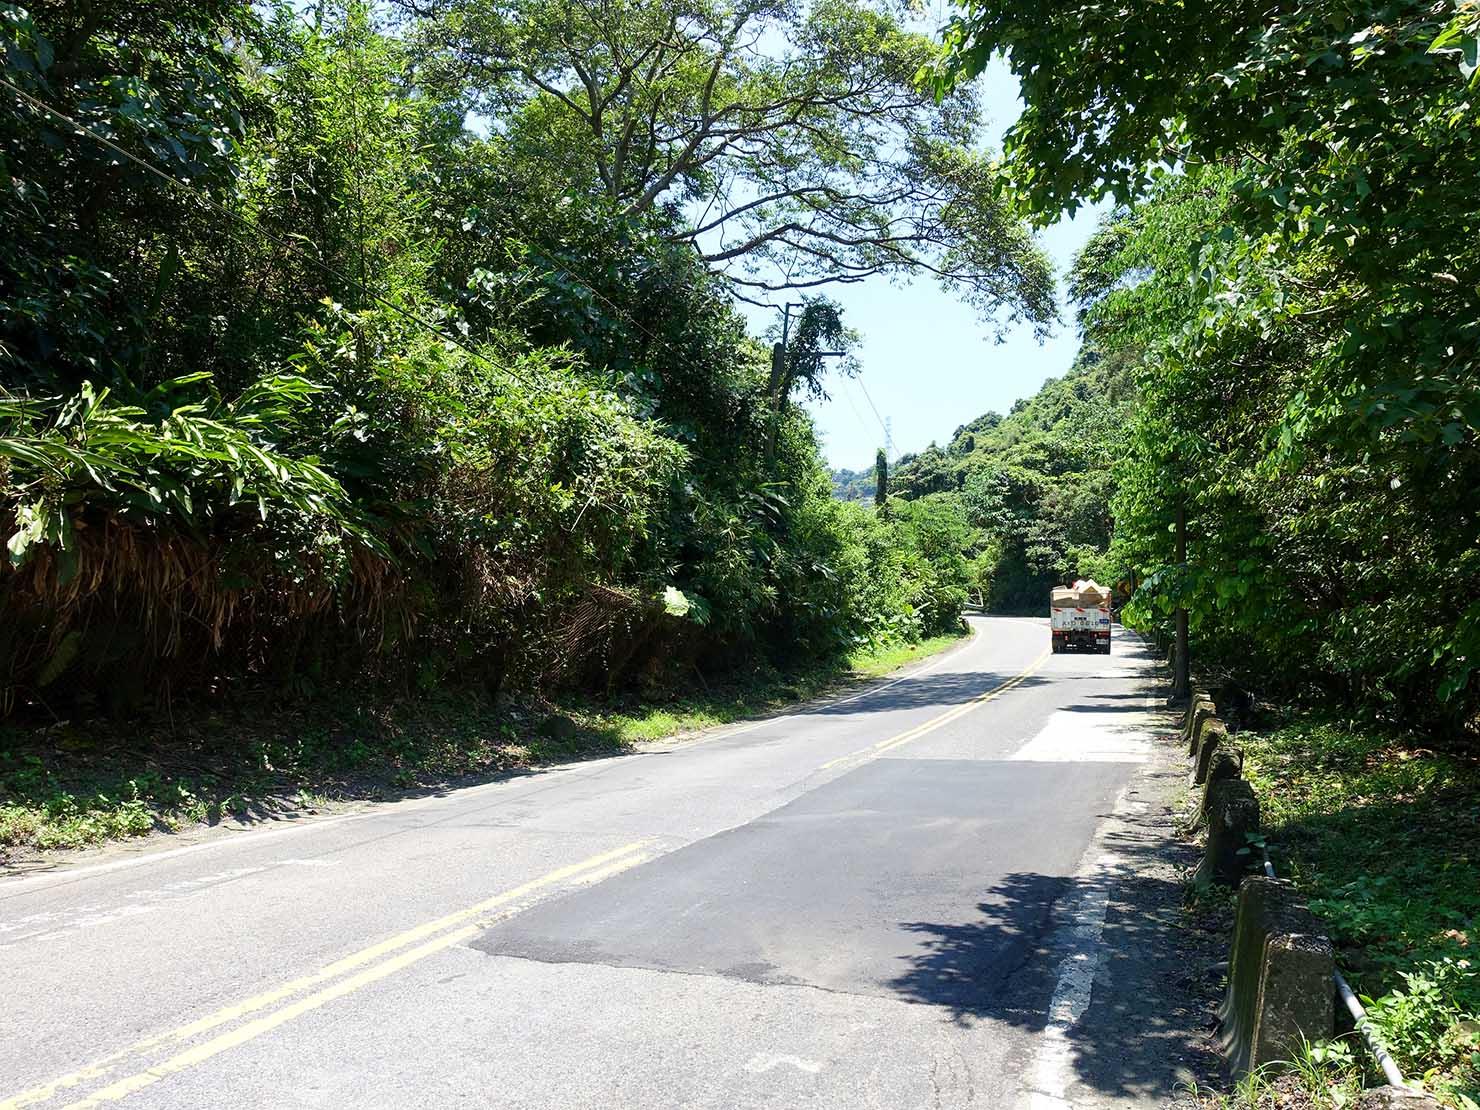 台北一周自転車道「福德坑環保復育公園」に伸びる坂道